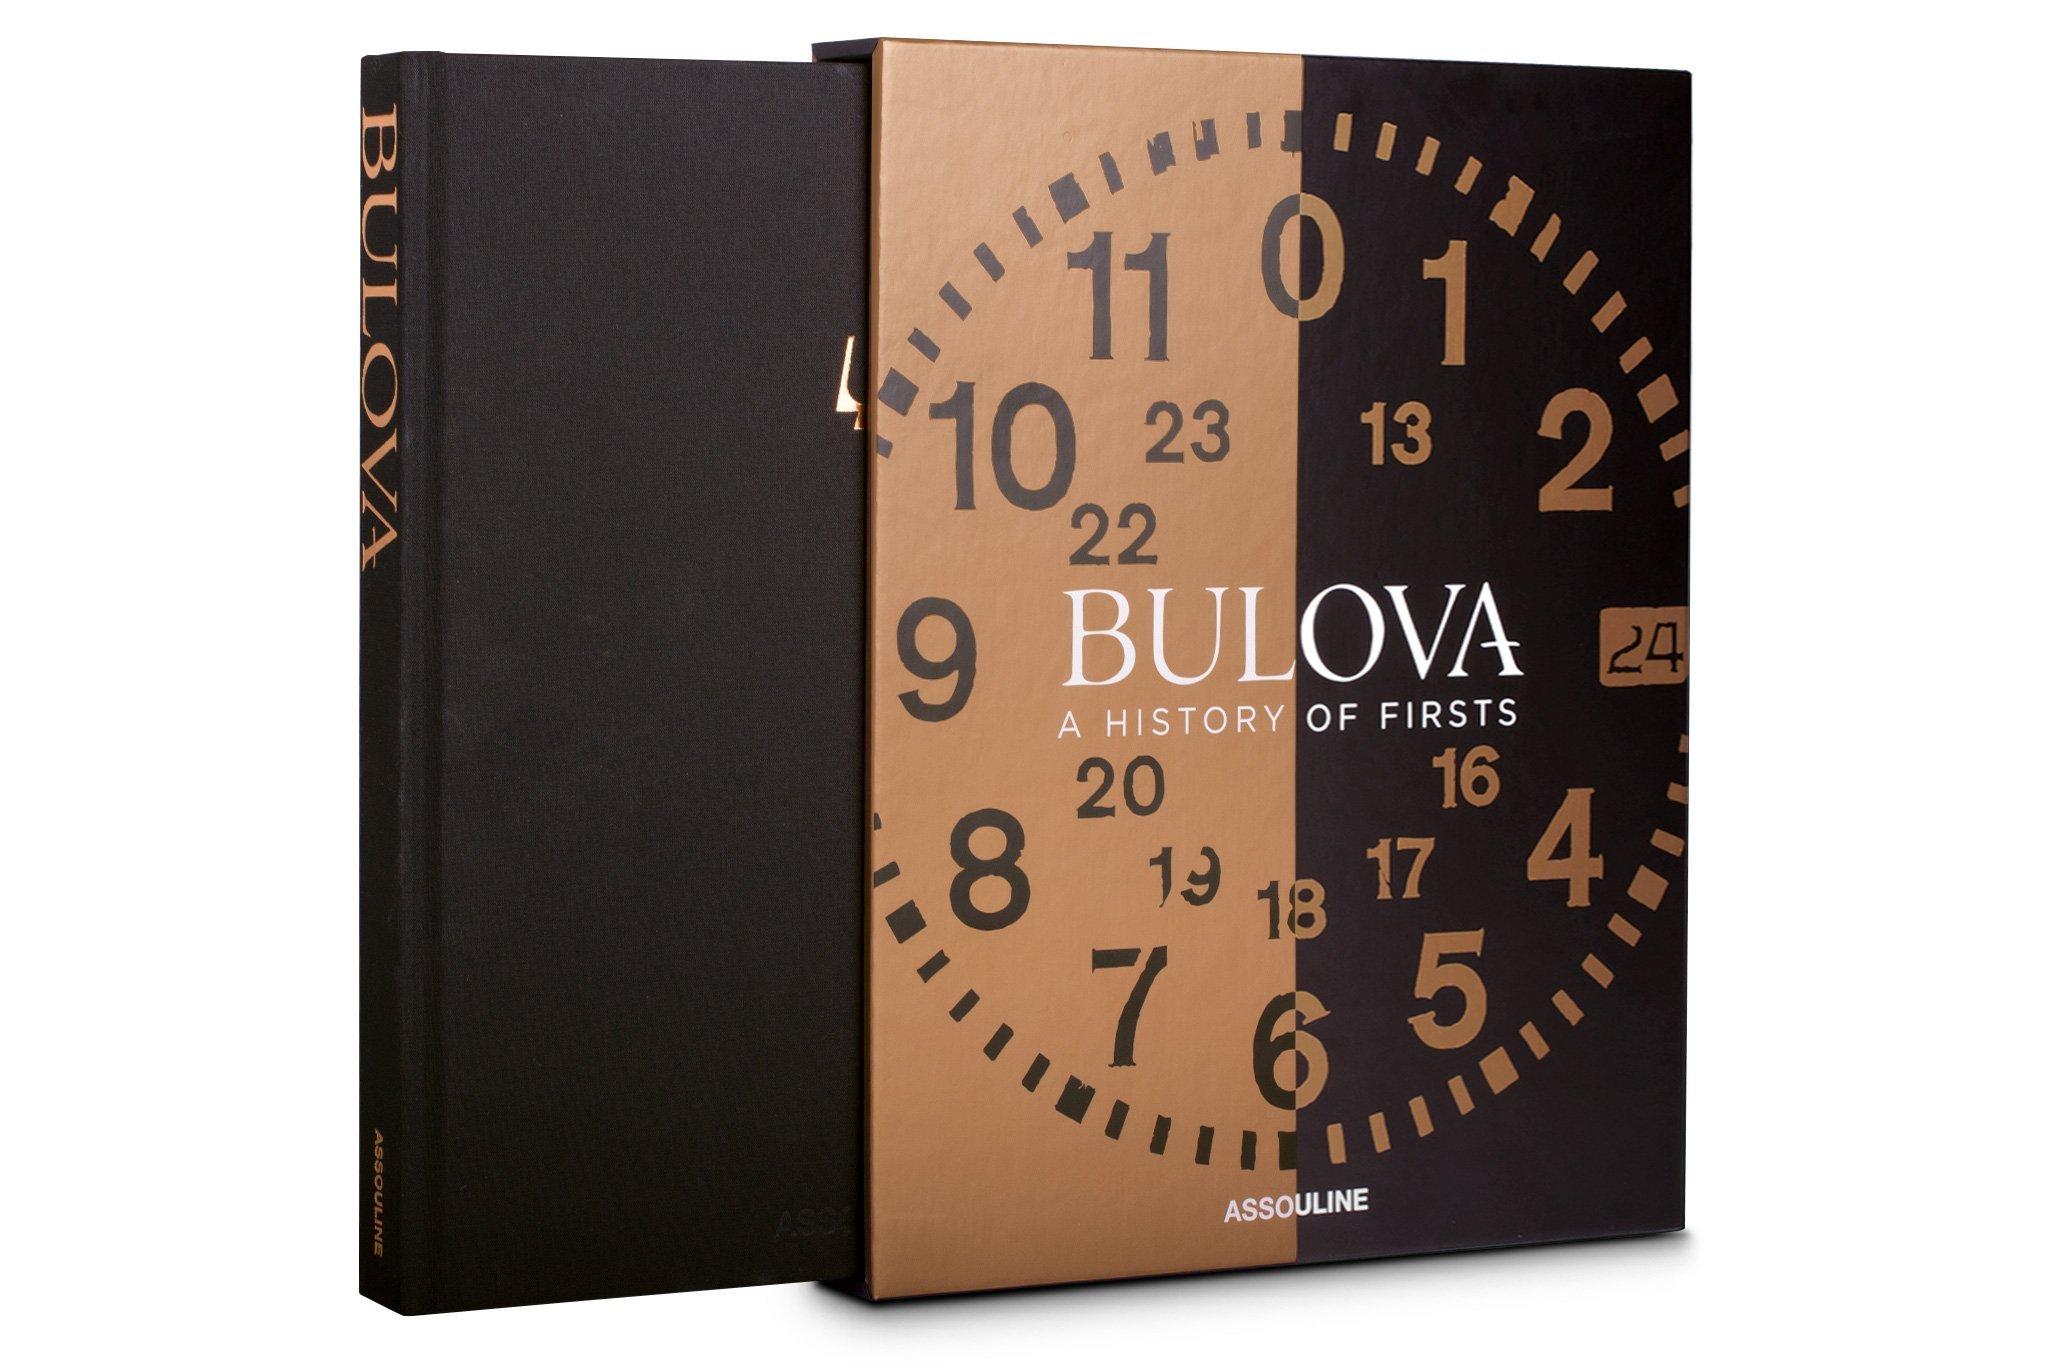 BULOVA-Slipcase_2048x.jpg